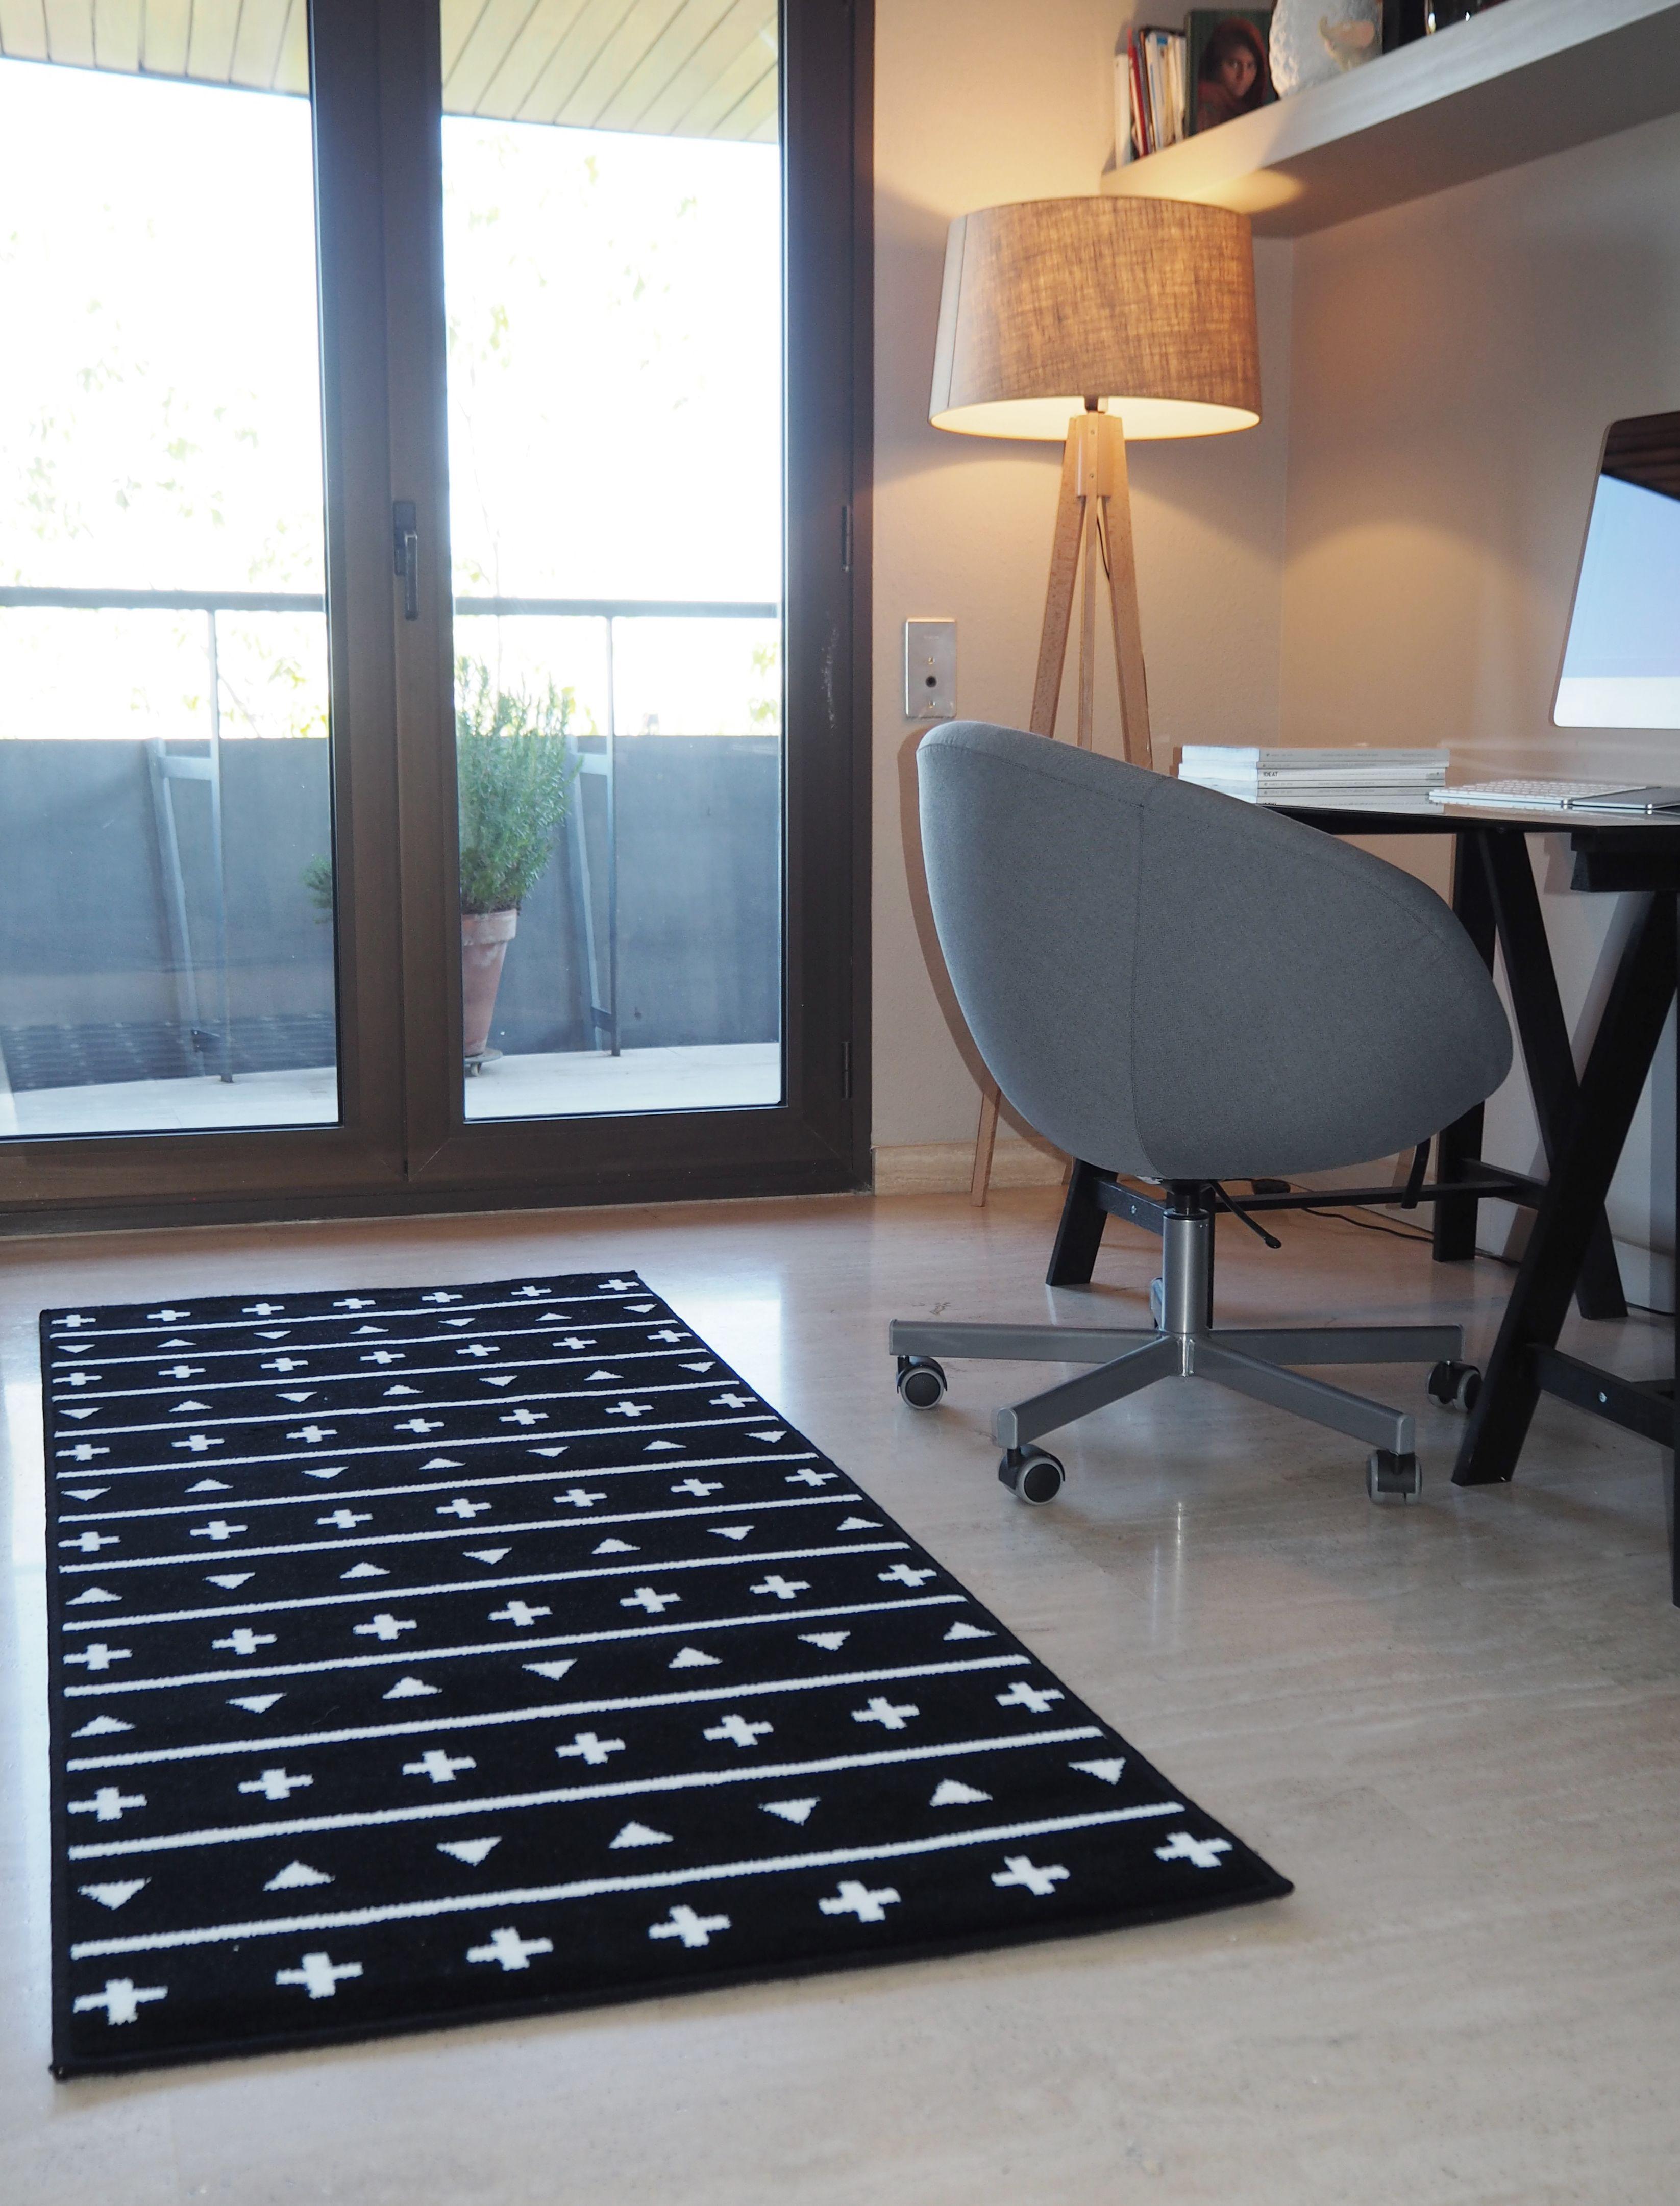 acrylic rug pattern collection / alfombra acrílica colección pattern